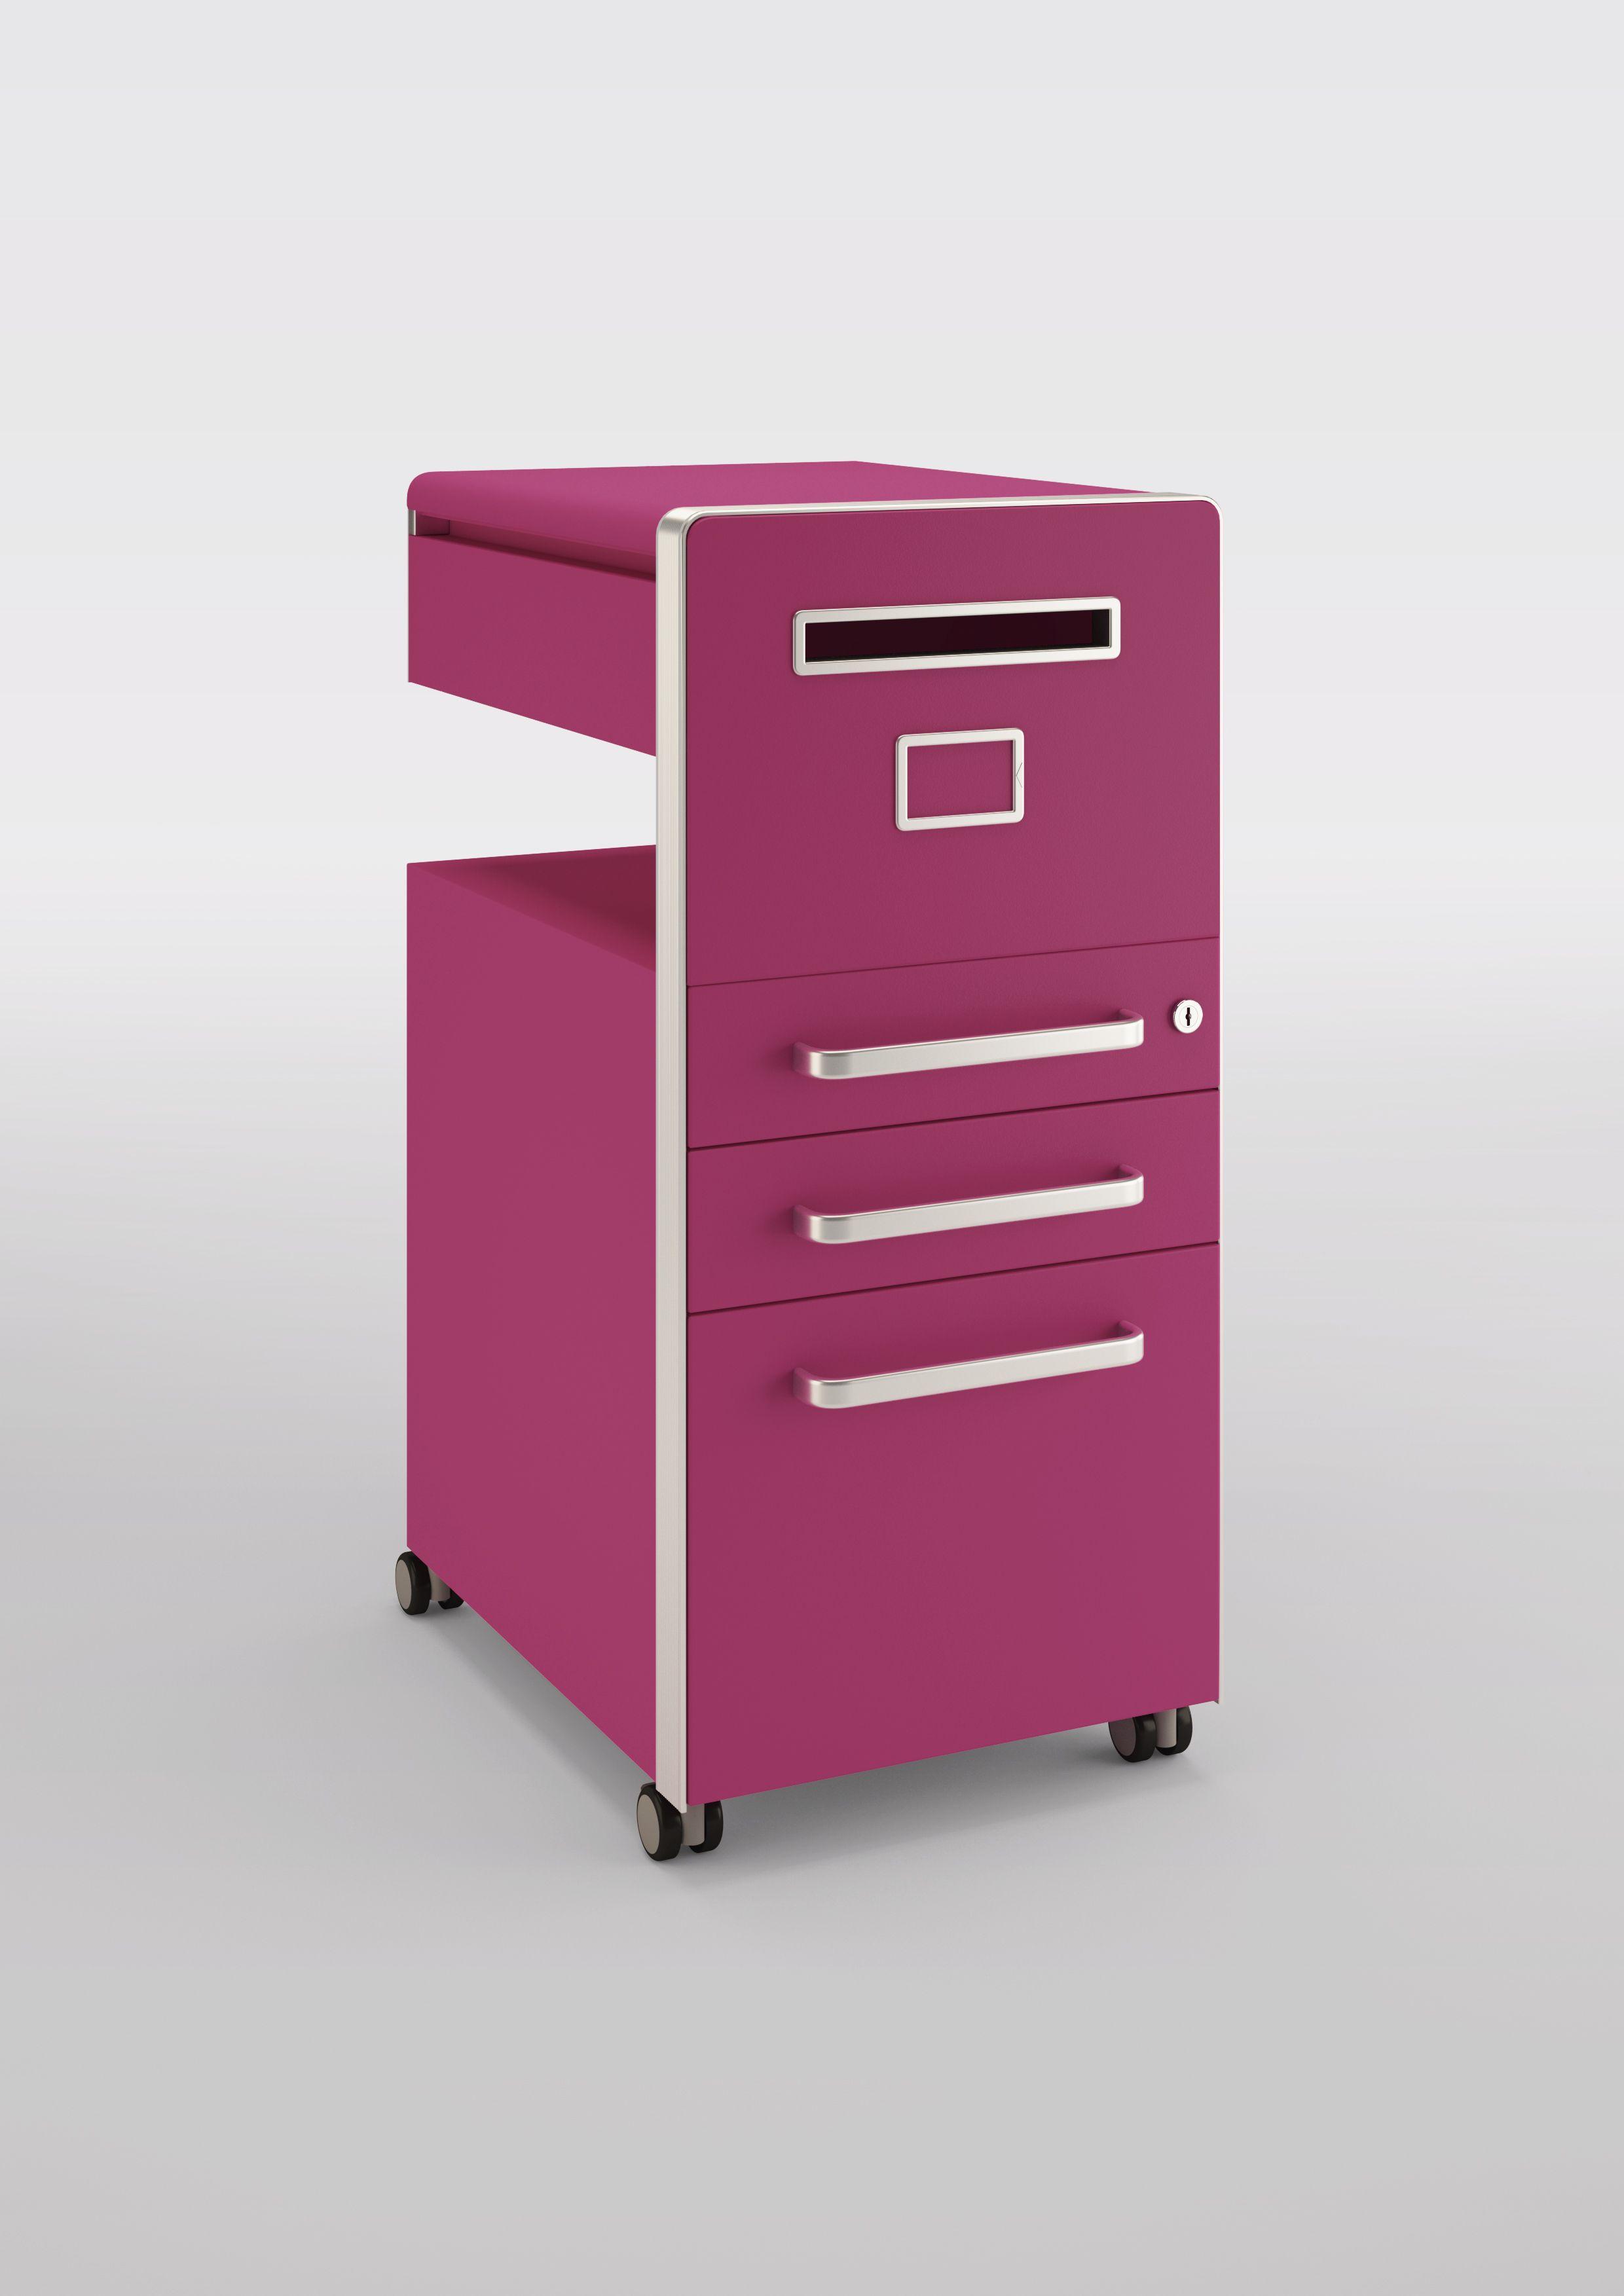 Bisley bite mobile pedestals office storage solutions